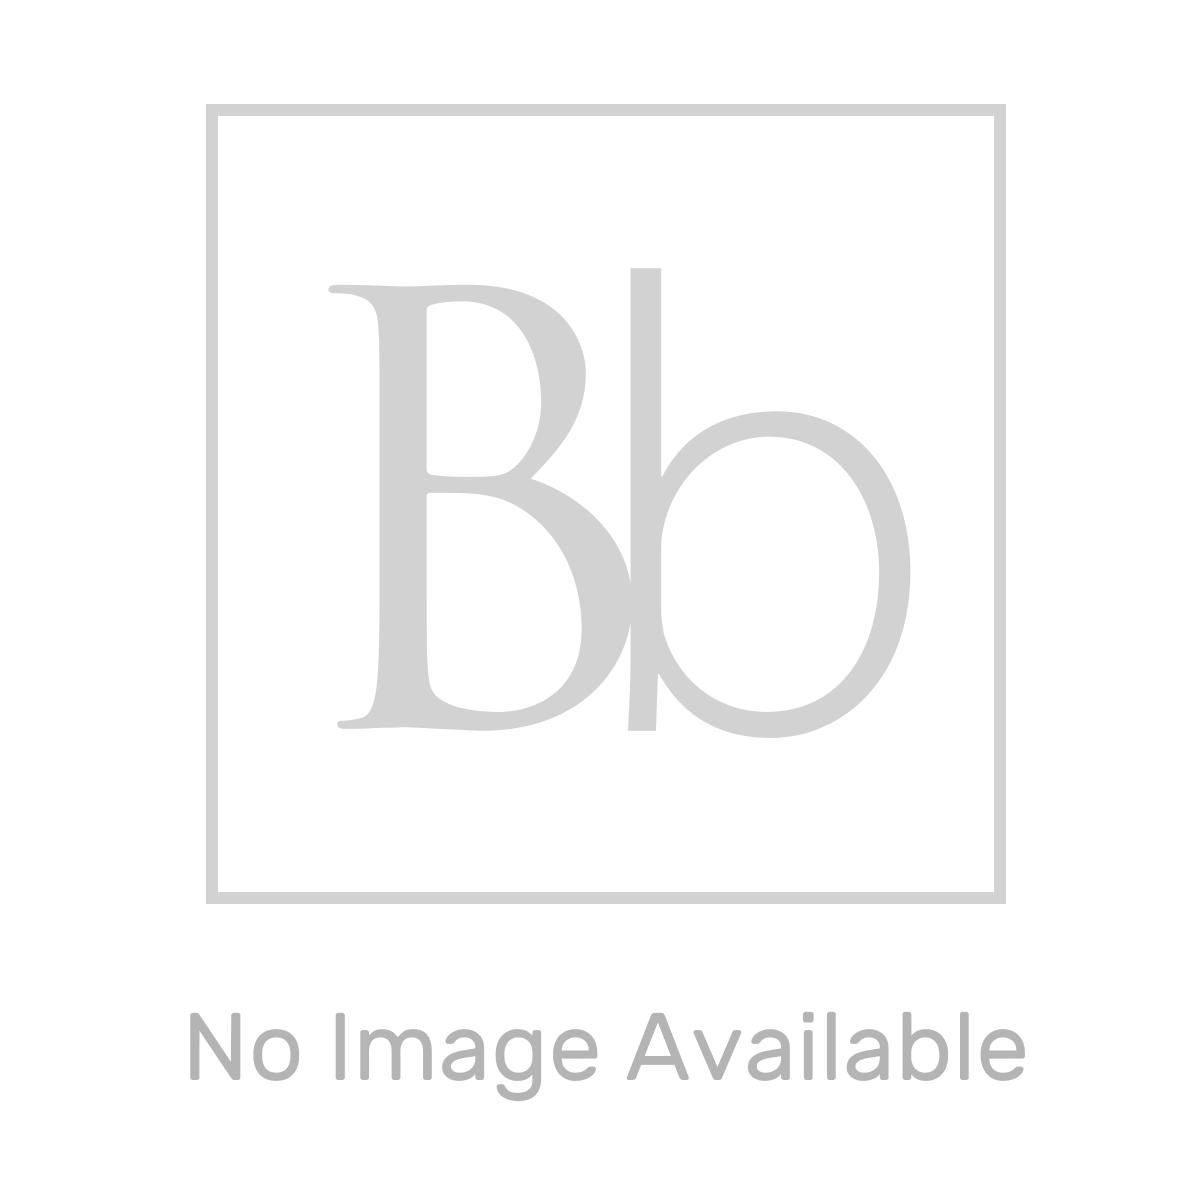 Nuie Athena Gloss White 2 Door Floor Standing Vanity Unit with 40mm Profile Basin 600mm